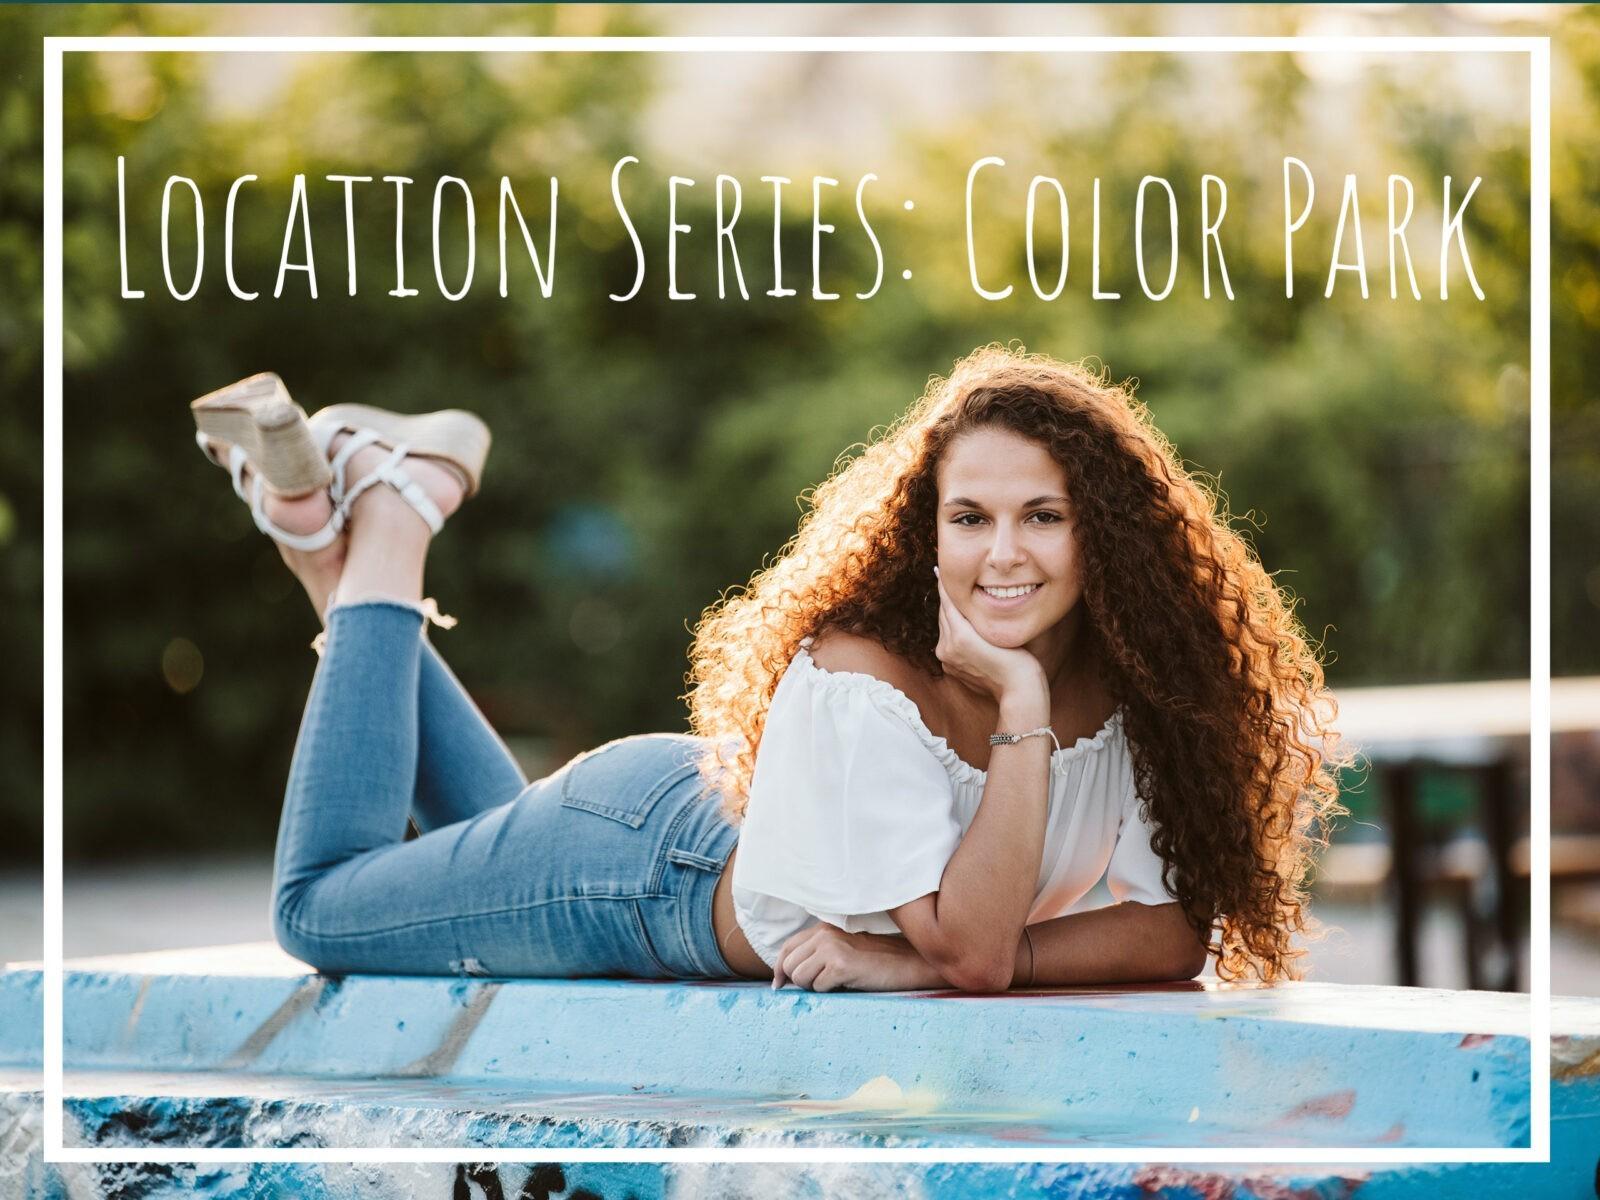 Senior Location Series: Color Park